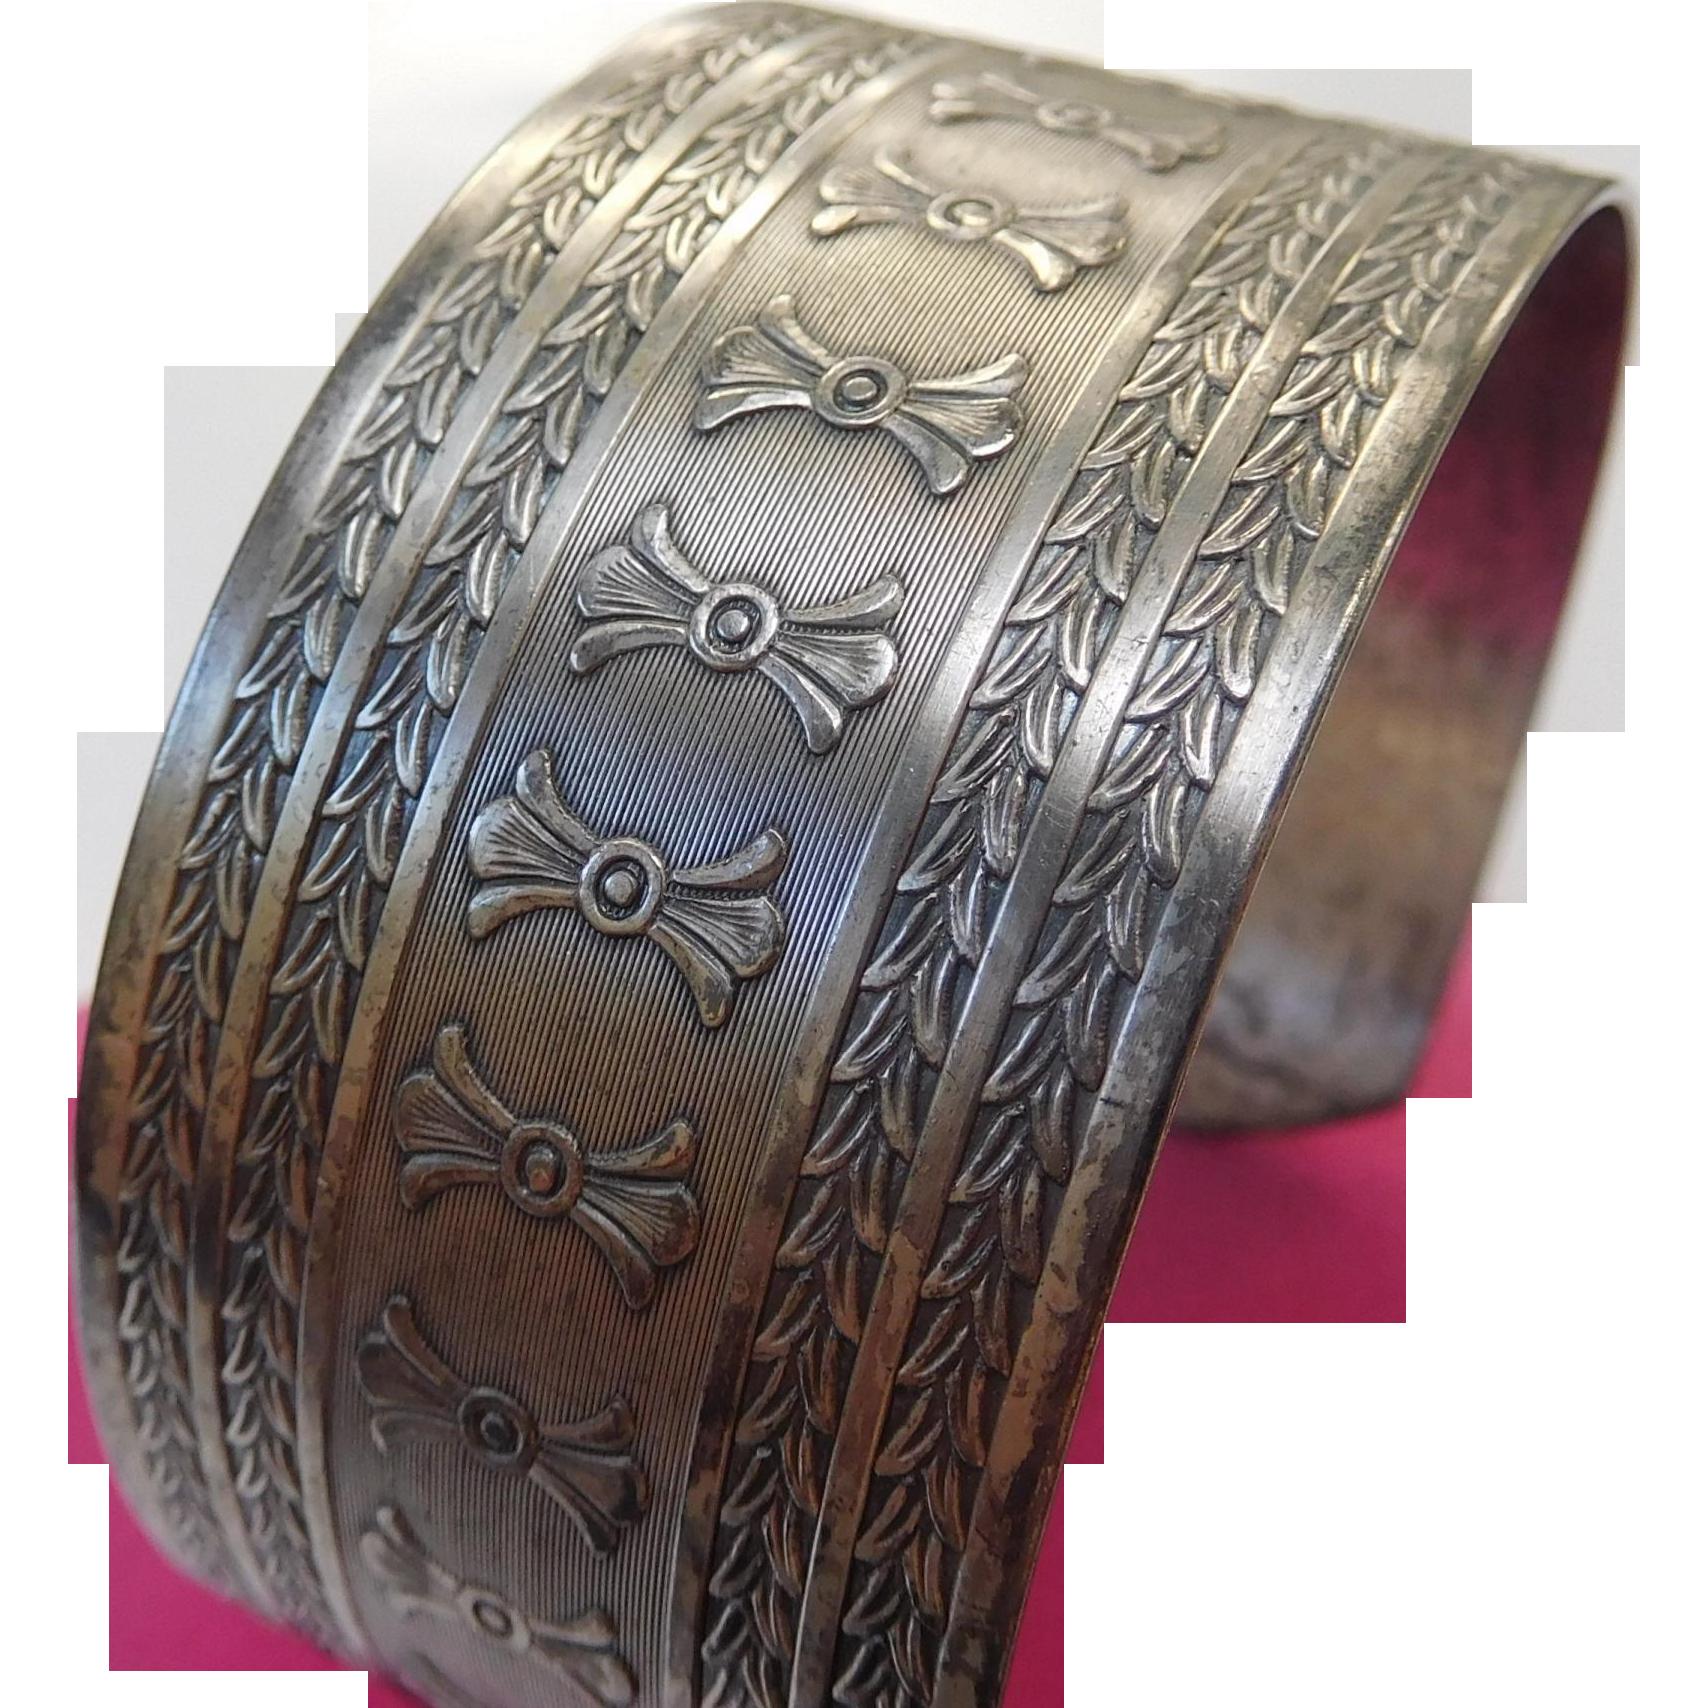 Victorian Aesthetic Era Cuff Bracelet, Copper, Foliage